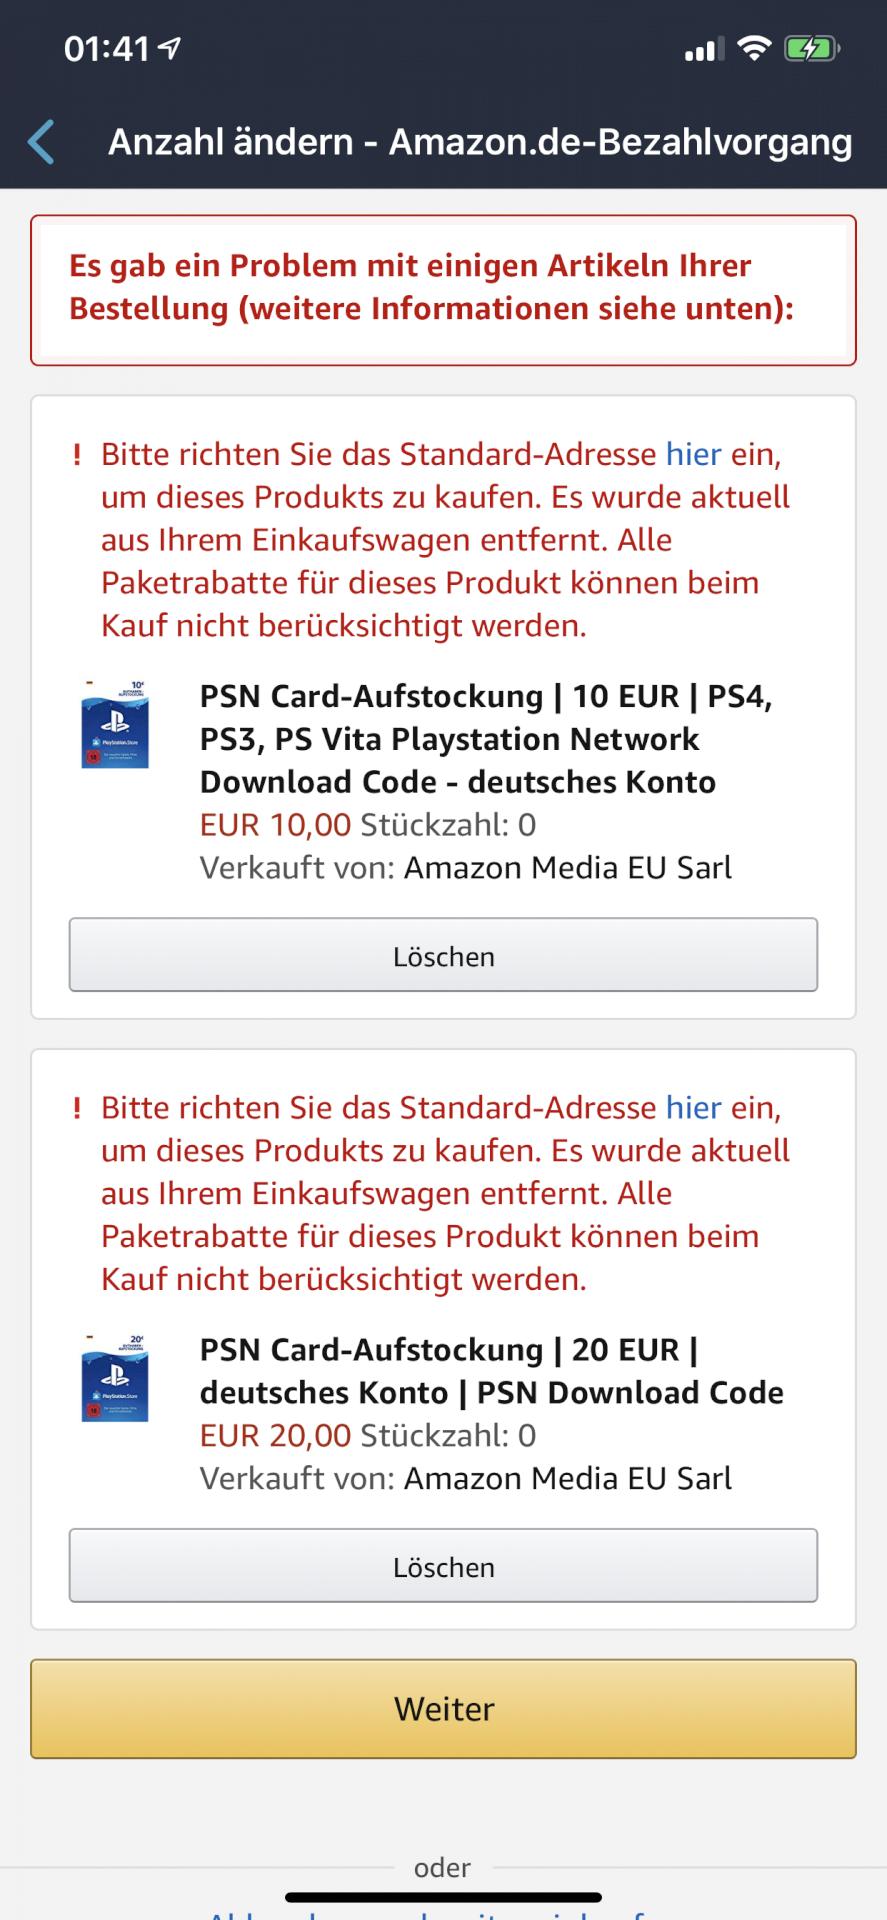 Amazon can't buy psn card? - ConsolesHub